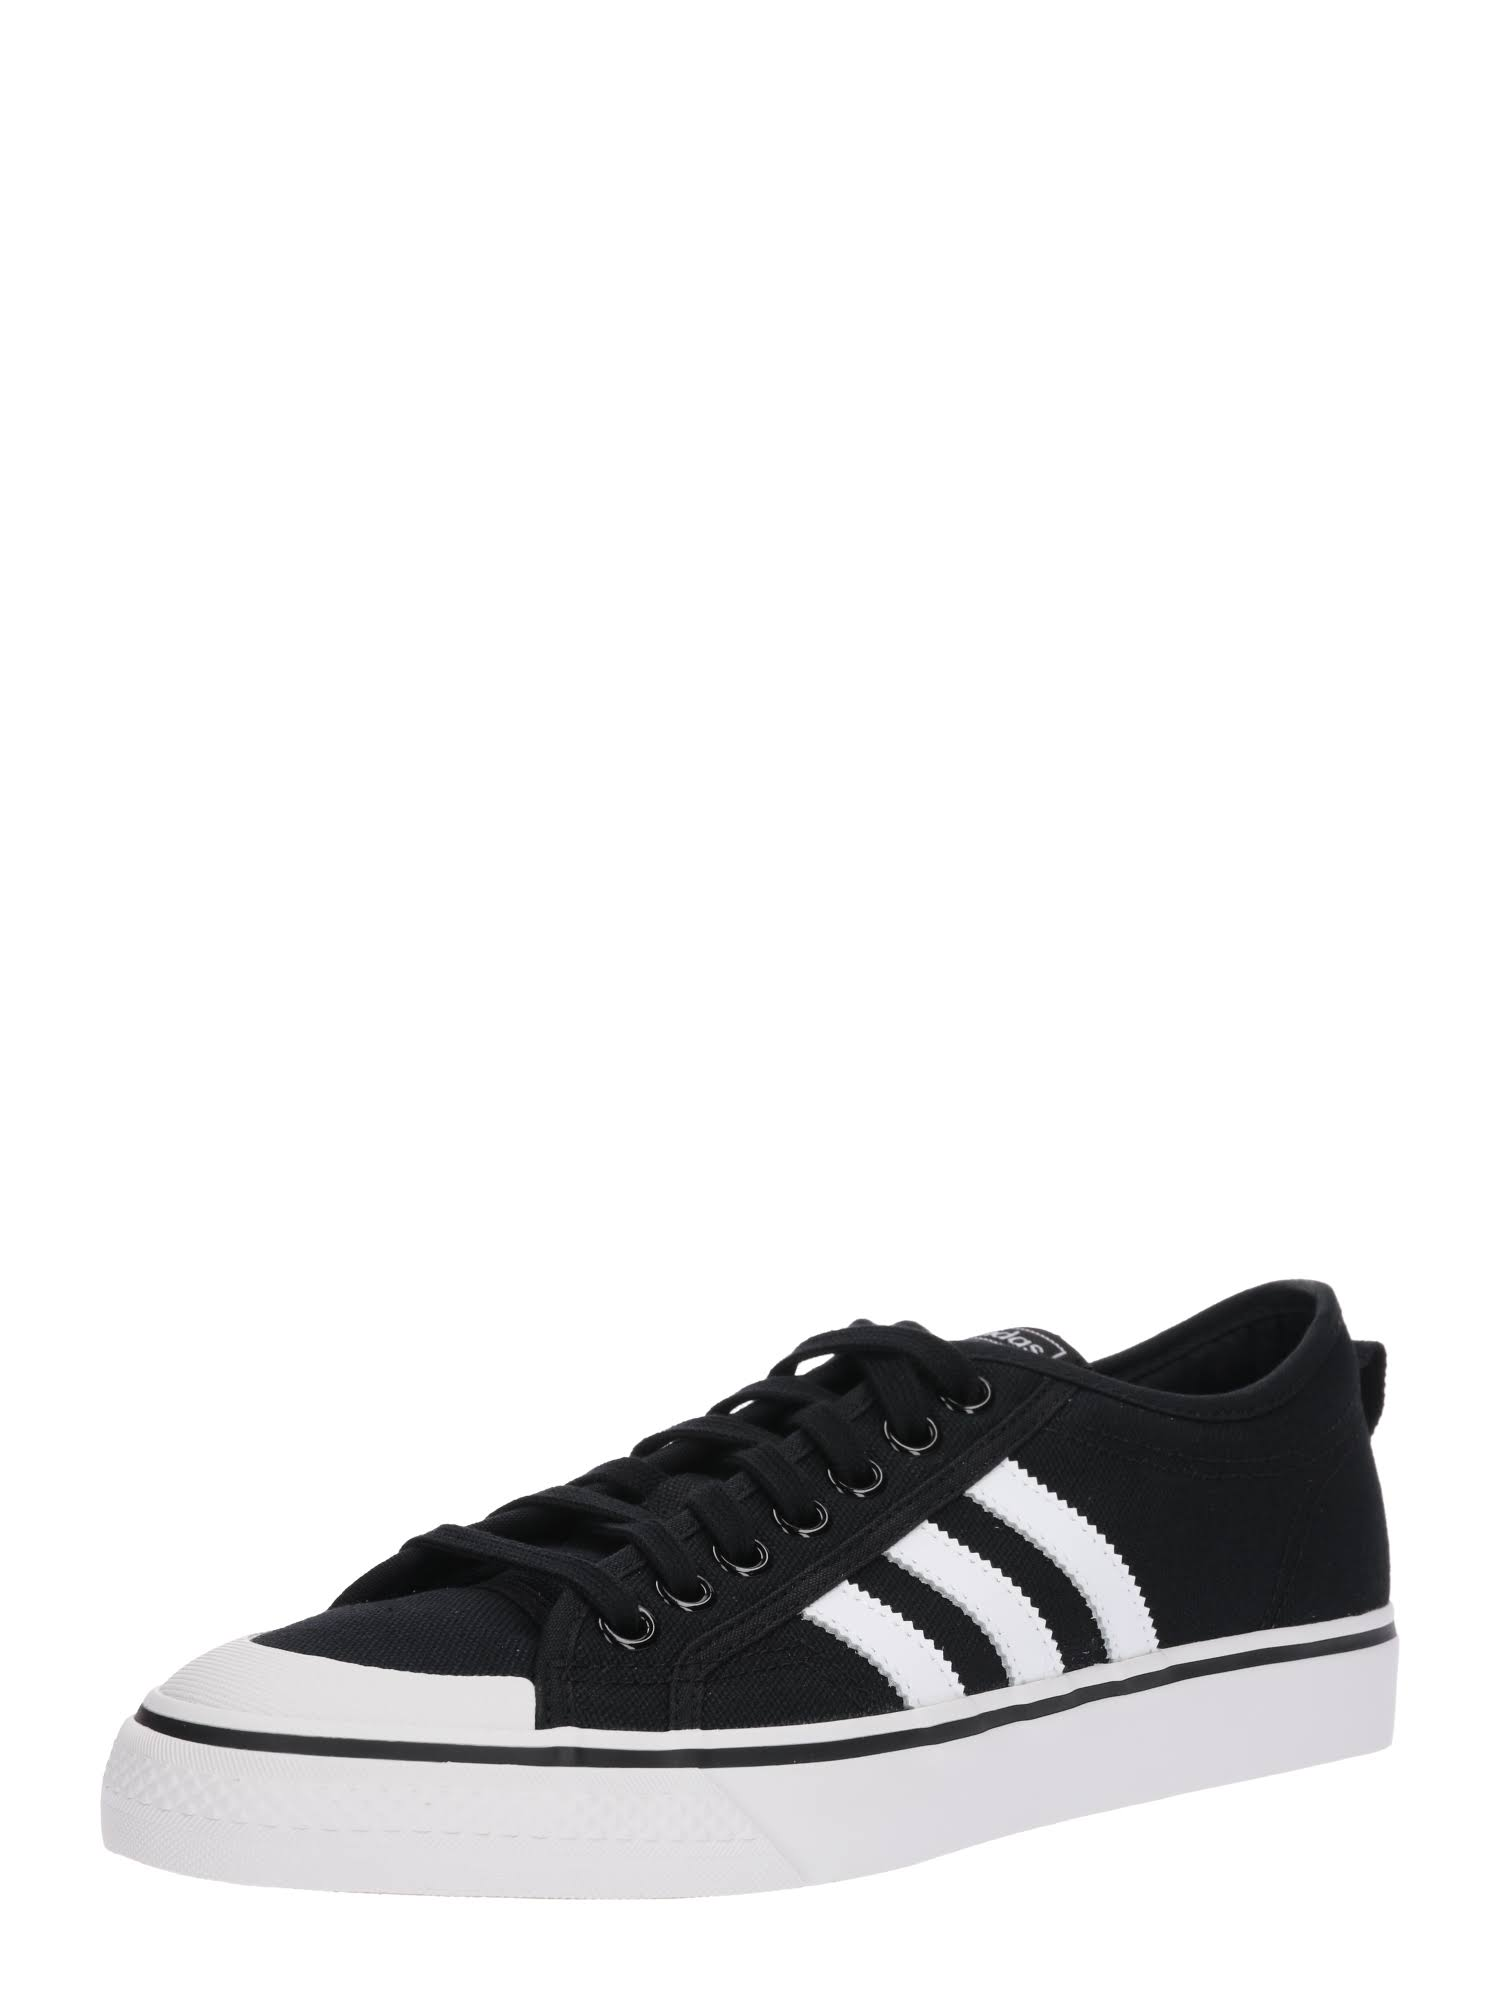 Adidas ftwr Core White crystal Black Sneaker Schwarz core 'nizza' White White S4qUSpwrxW